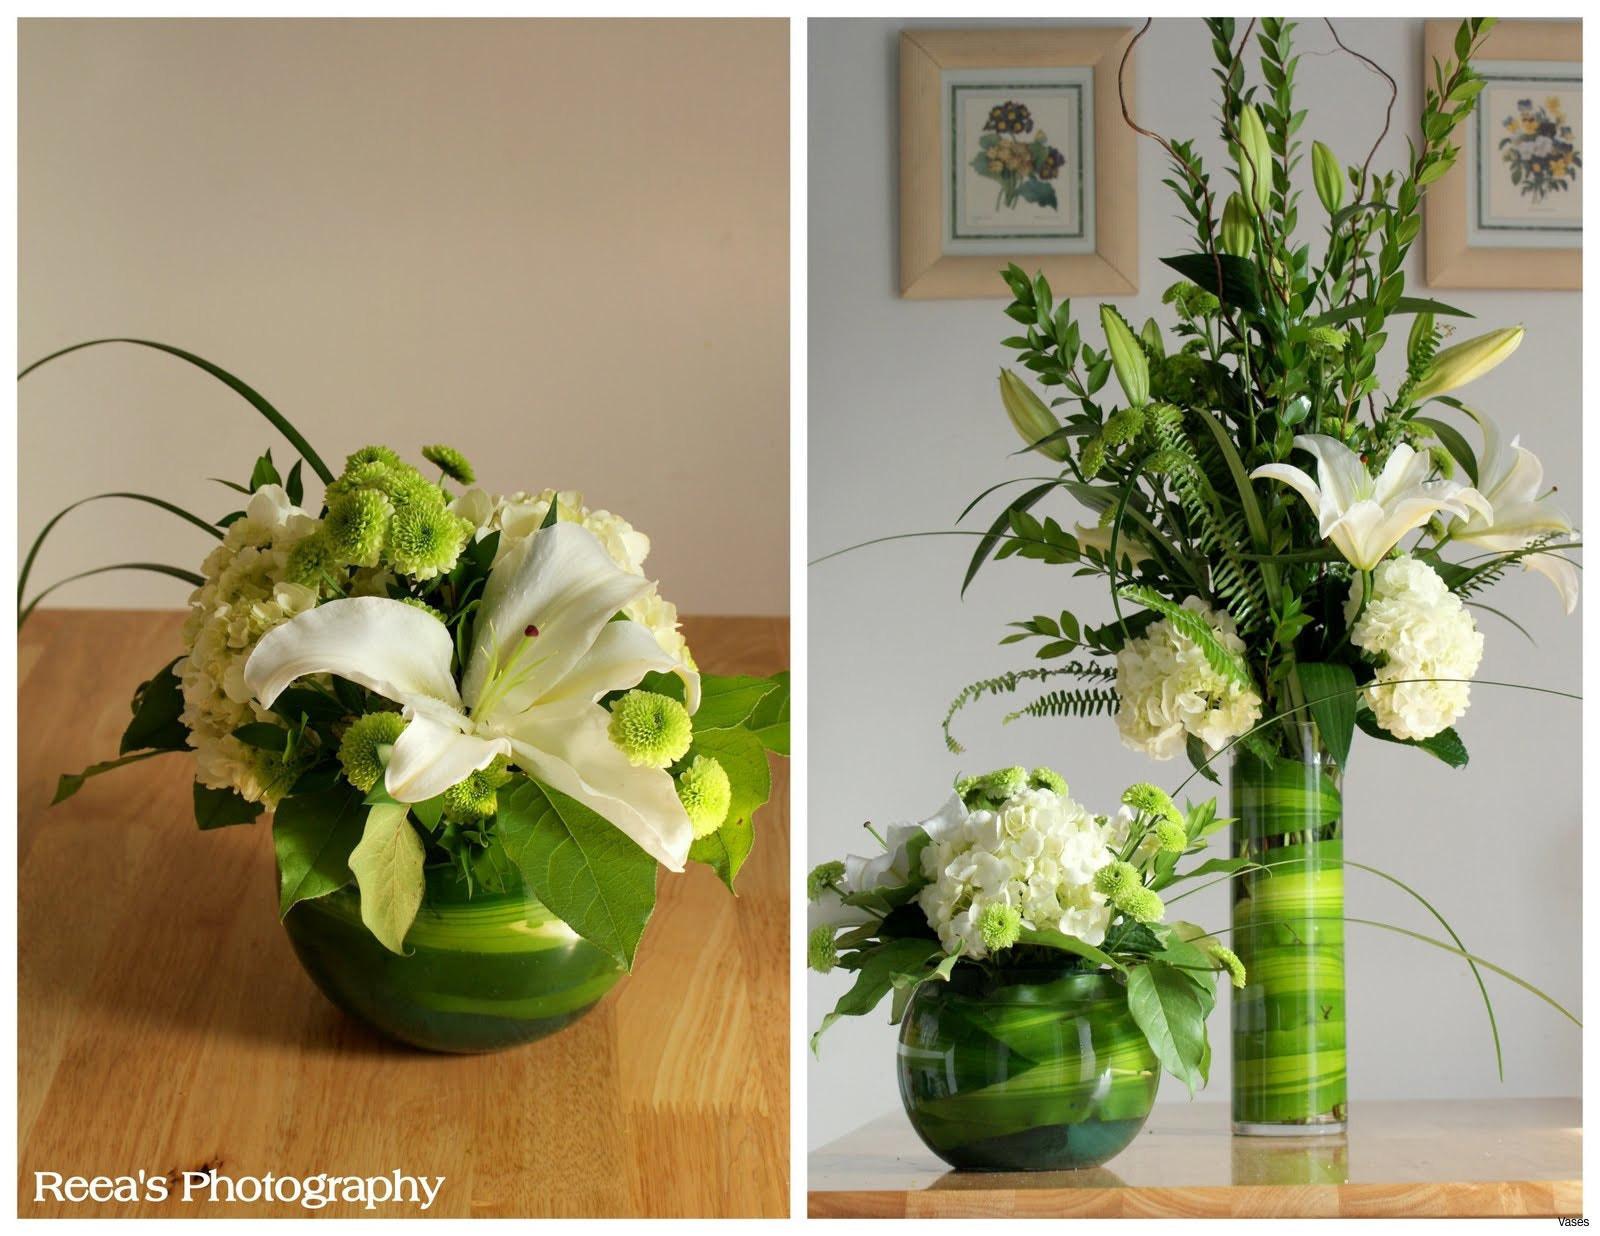 small round vase flower arrangements of tall green vase photos 6x6x6 glass vase lovely h vases for flower in 6x6x6 glass vase lovely h vases for flower arrangements i 0d dry